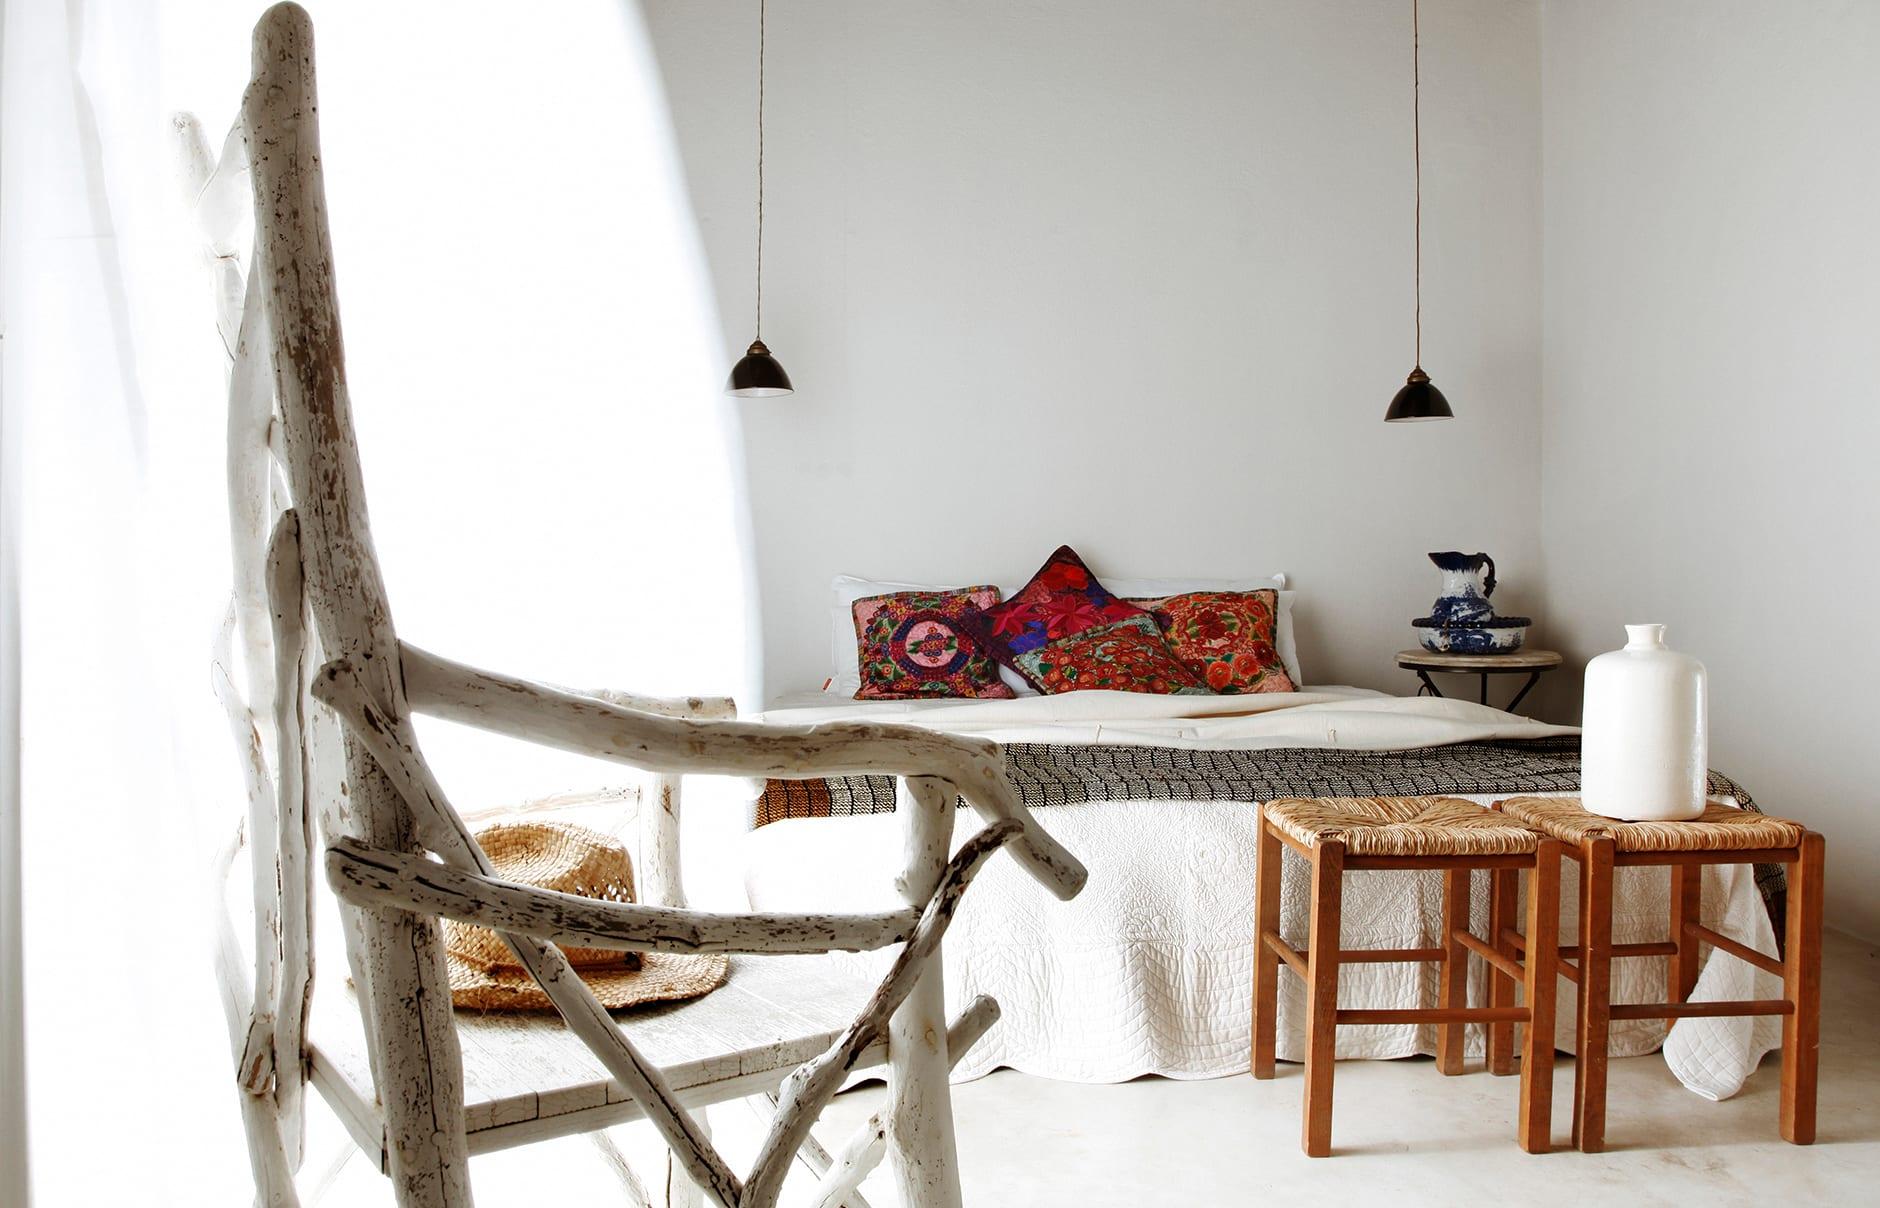 Room. San Giorgio Mykonos a Design Hotels™ Project, Greece. © SAN GIORGIO